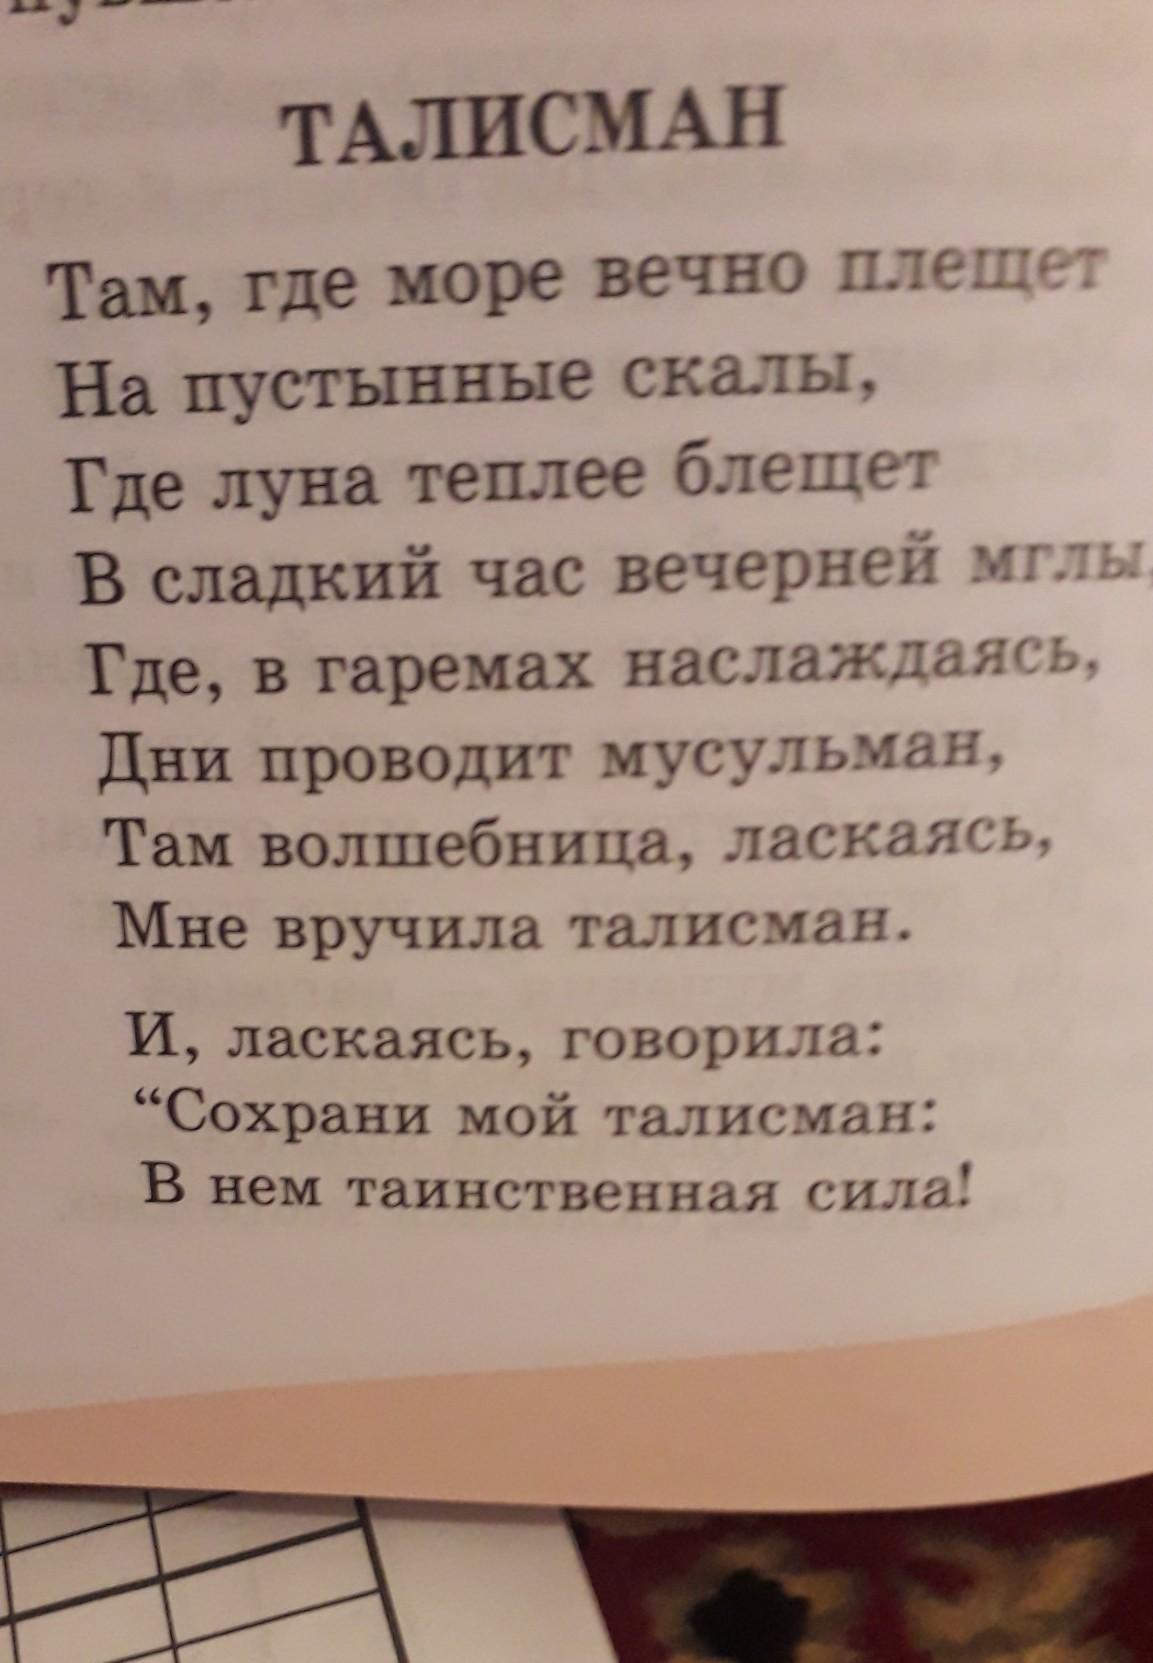 талисман стихи пушкина сложно этом